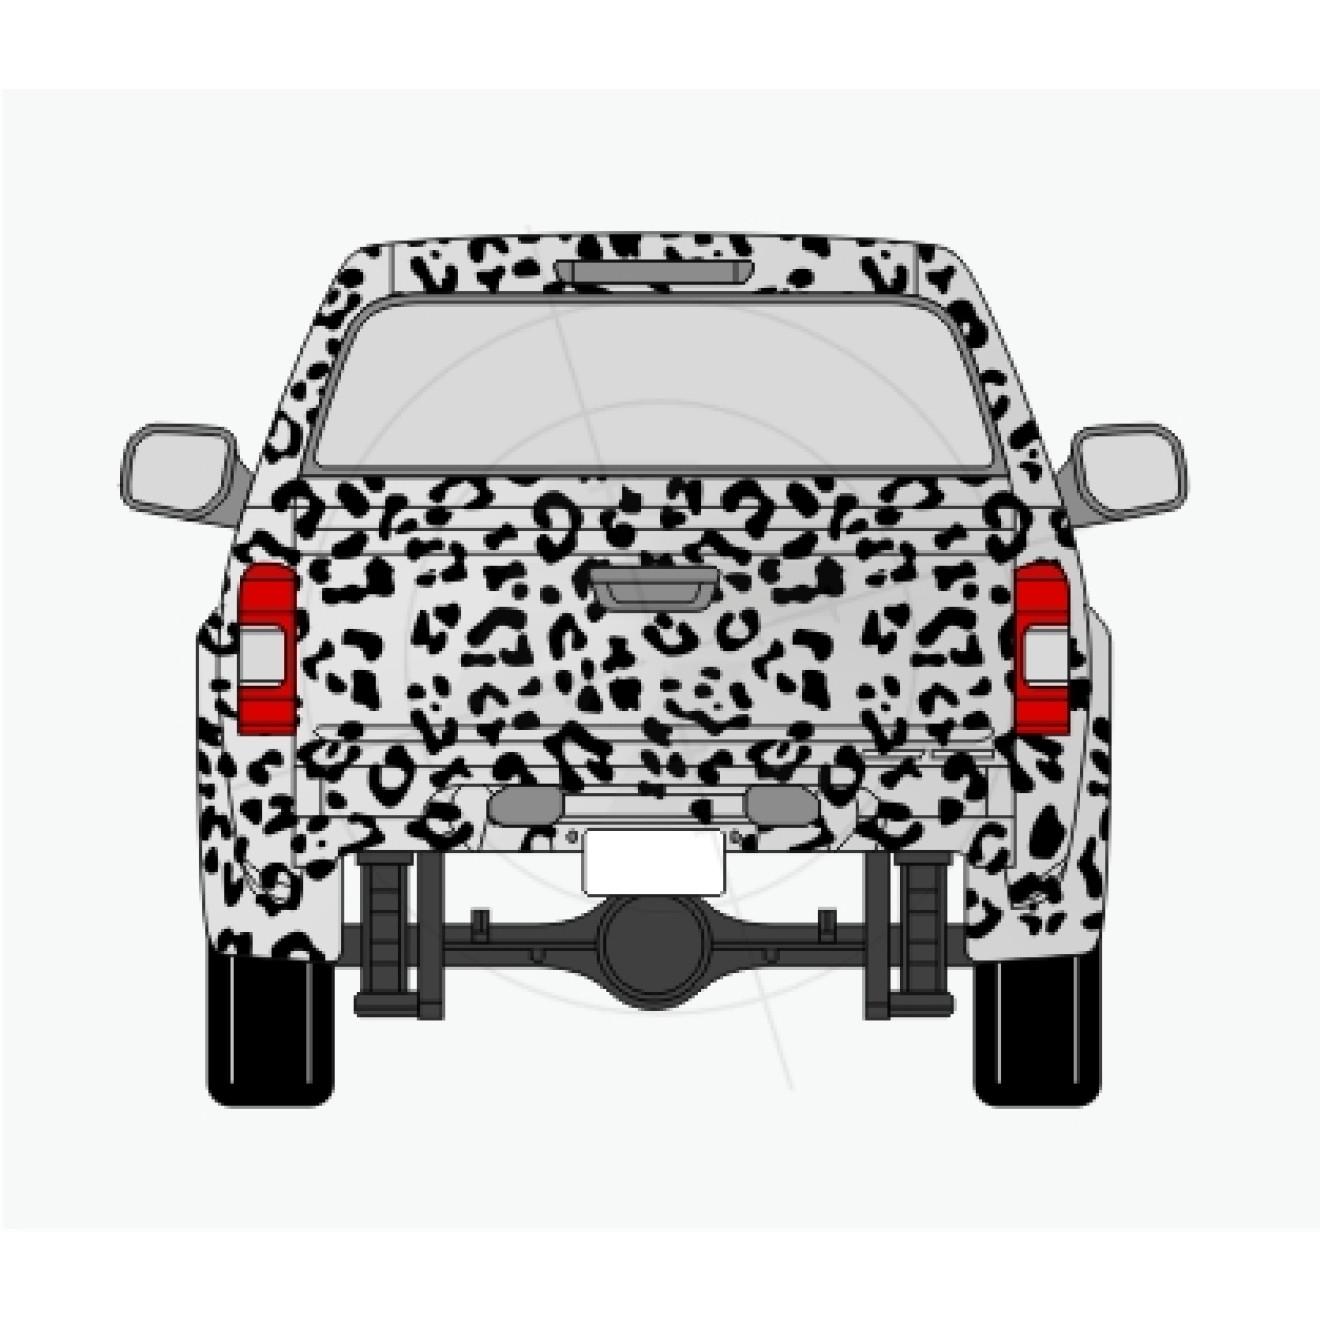 leopardenfell aufkleber f r auto pkw kfz transporter caravan. Black Bedroom Furniture Sets. Home Design Ideas